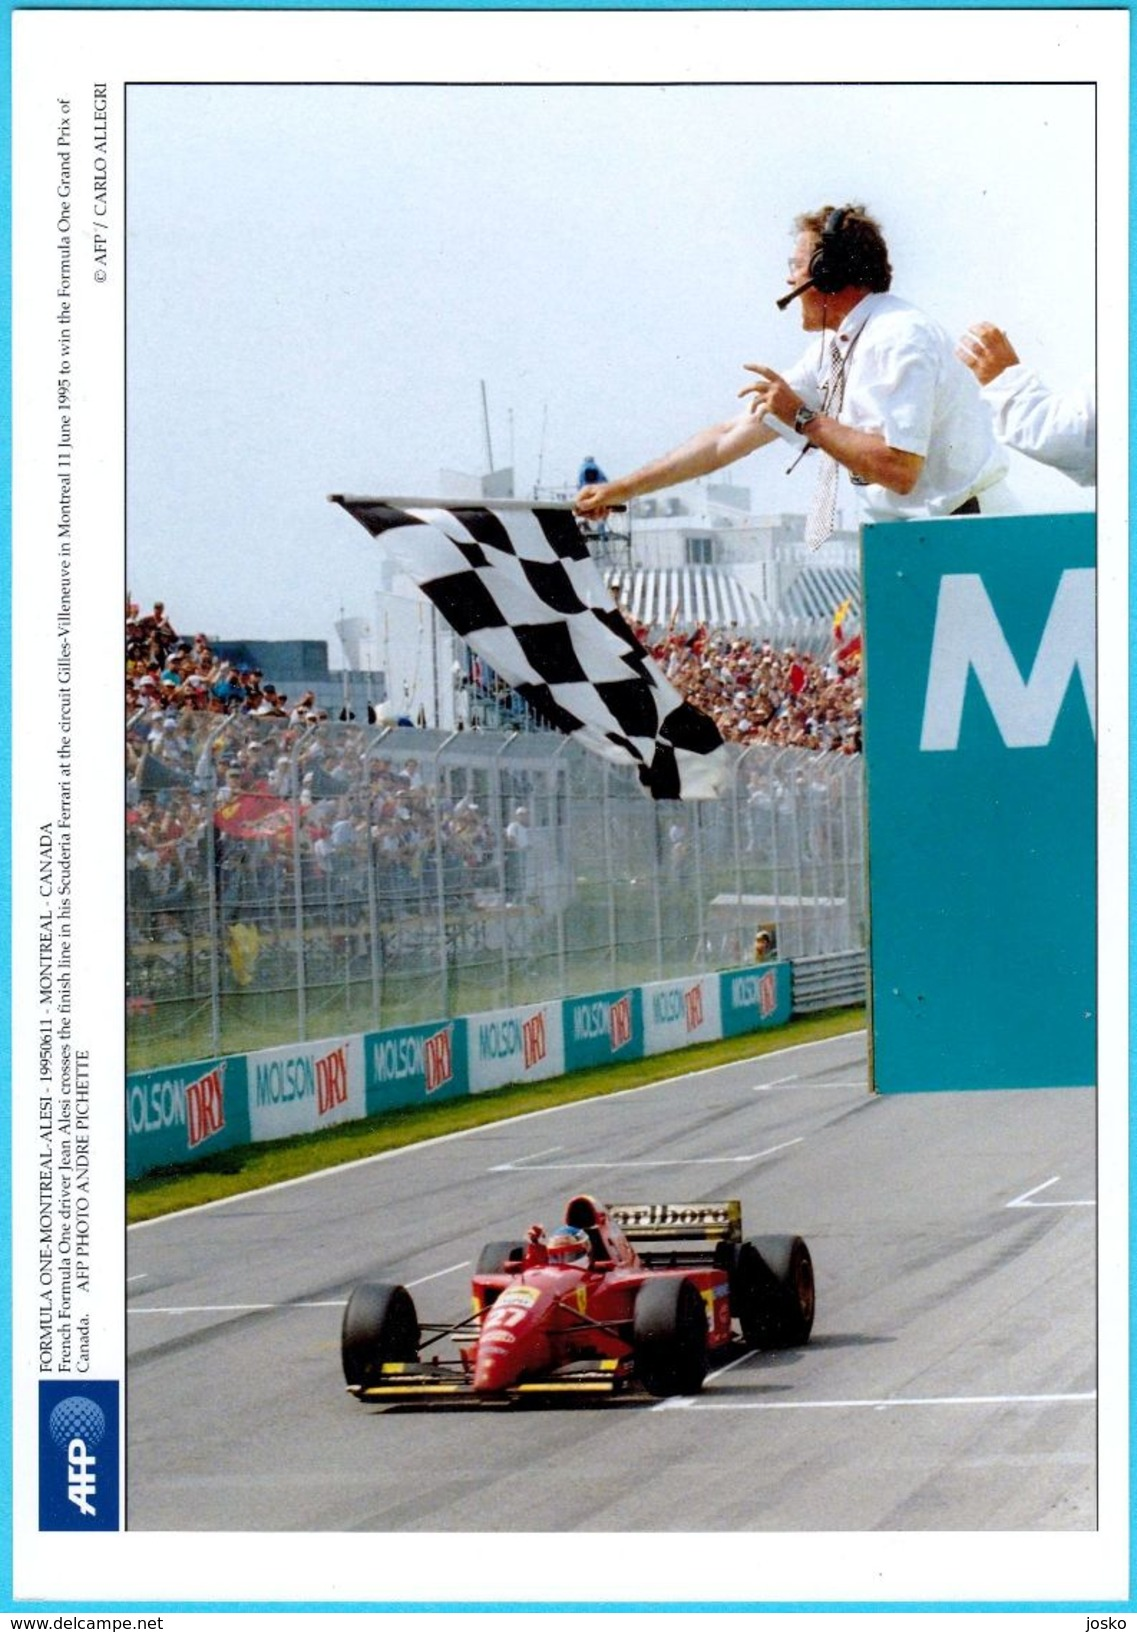 JEAN ALESI - Canada Grand Prix Montreal 1995. *** BEAUTIFULL LARGE PHOTO *** Ferrari F1 Formula 1 Car Automobile - Car Racing - F1